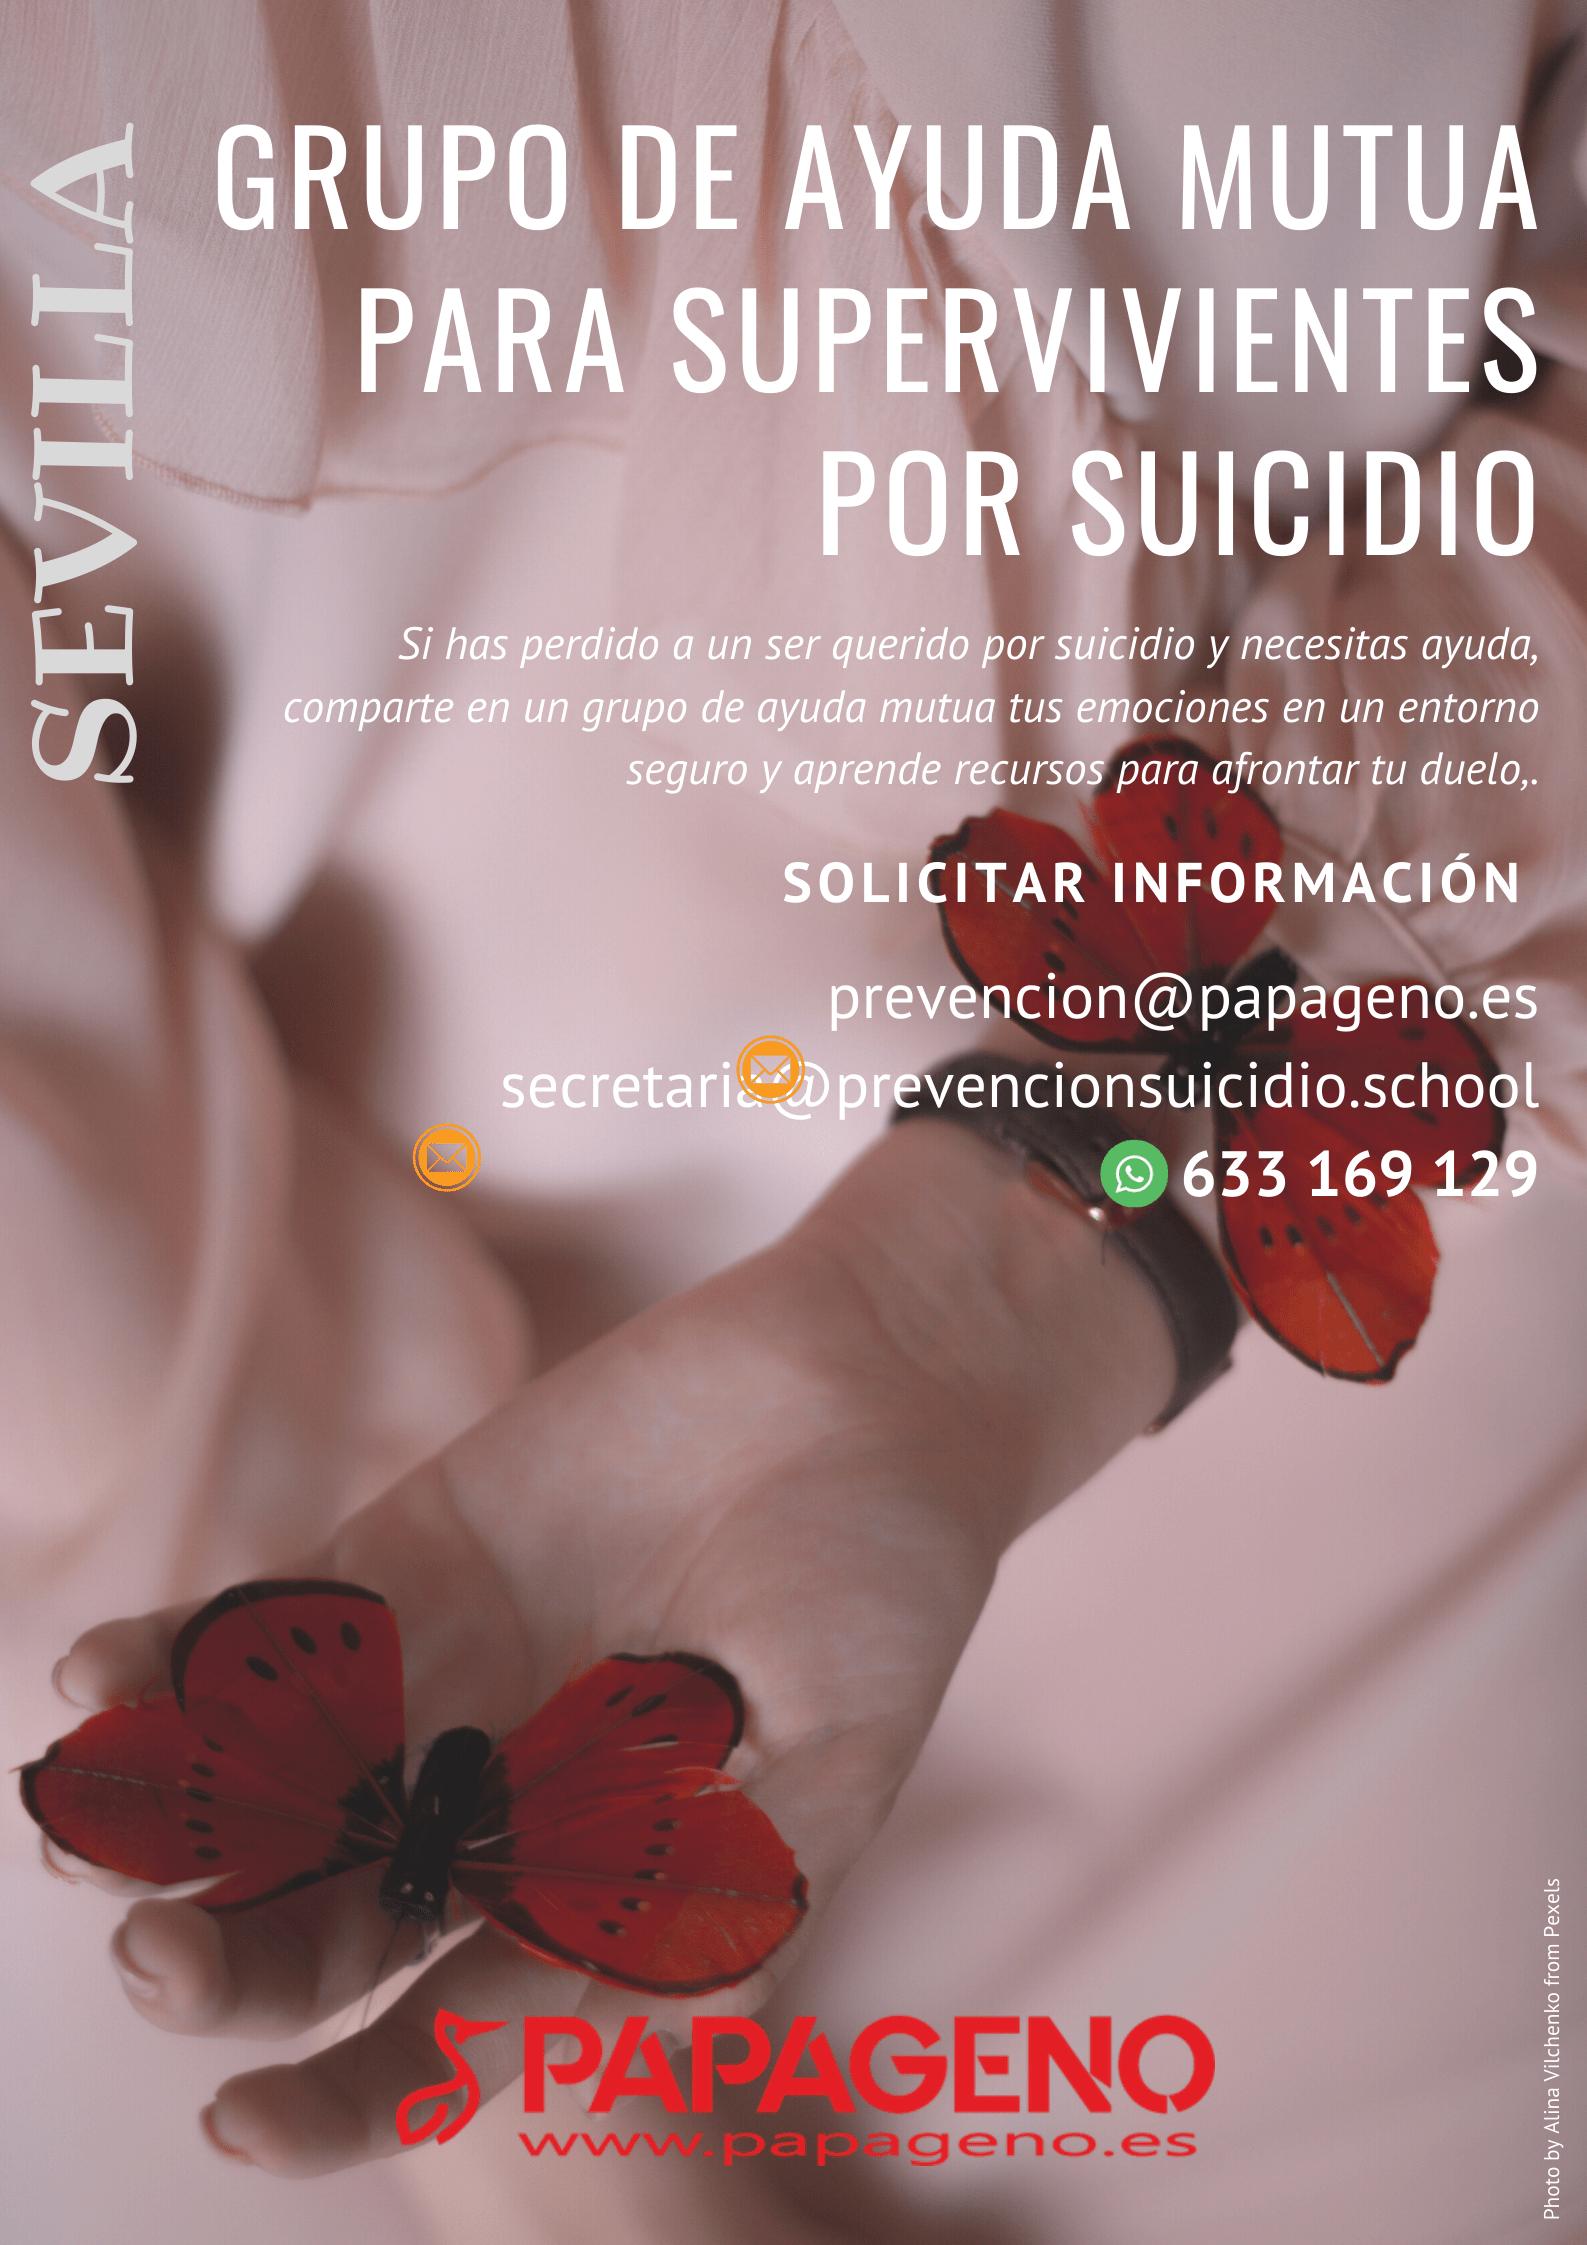 Grupo de Ayuda Mutua para Supervivientes Sevilla